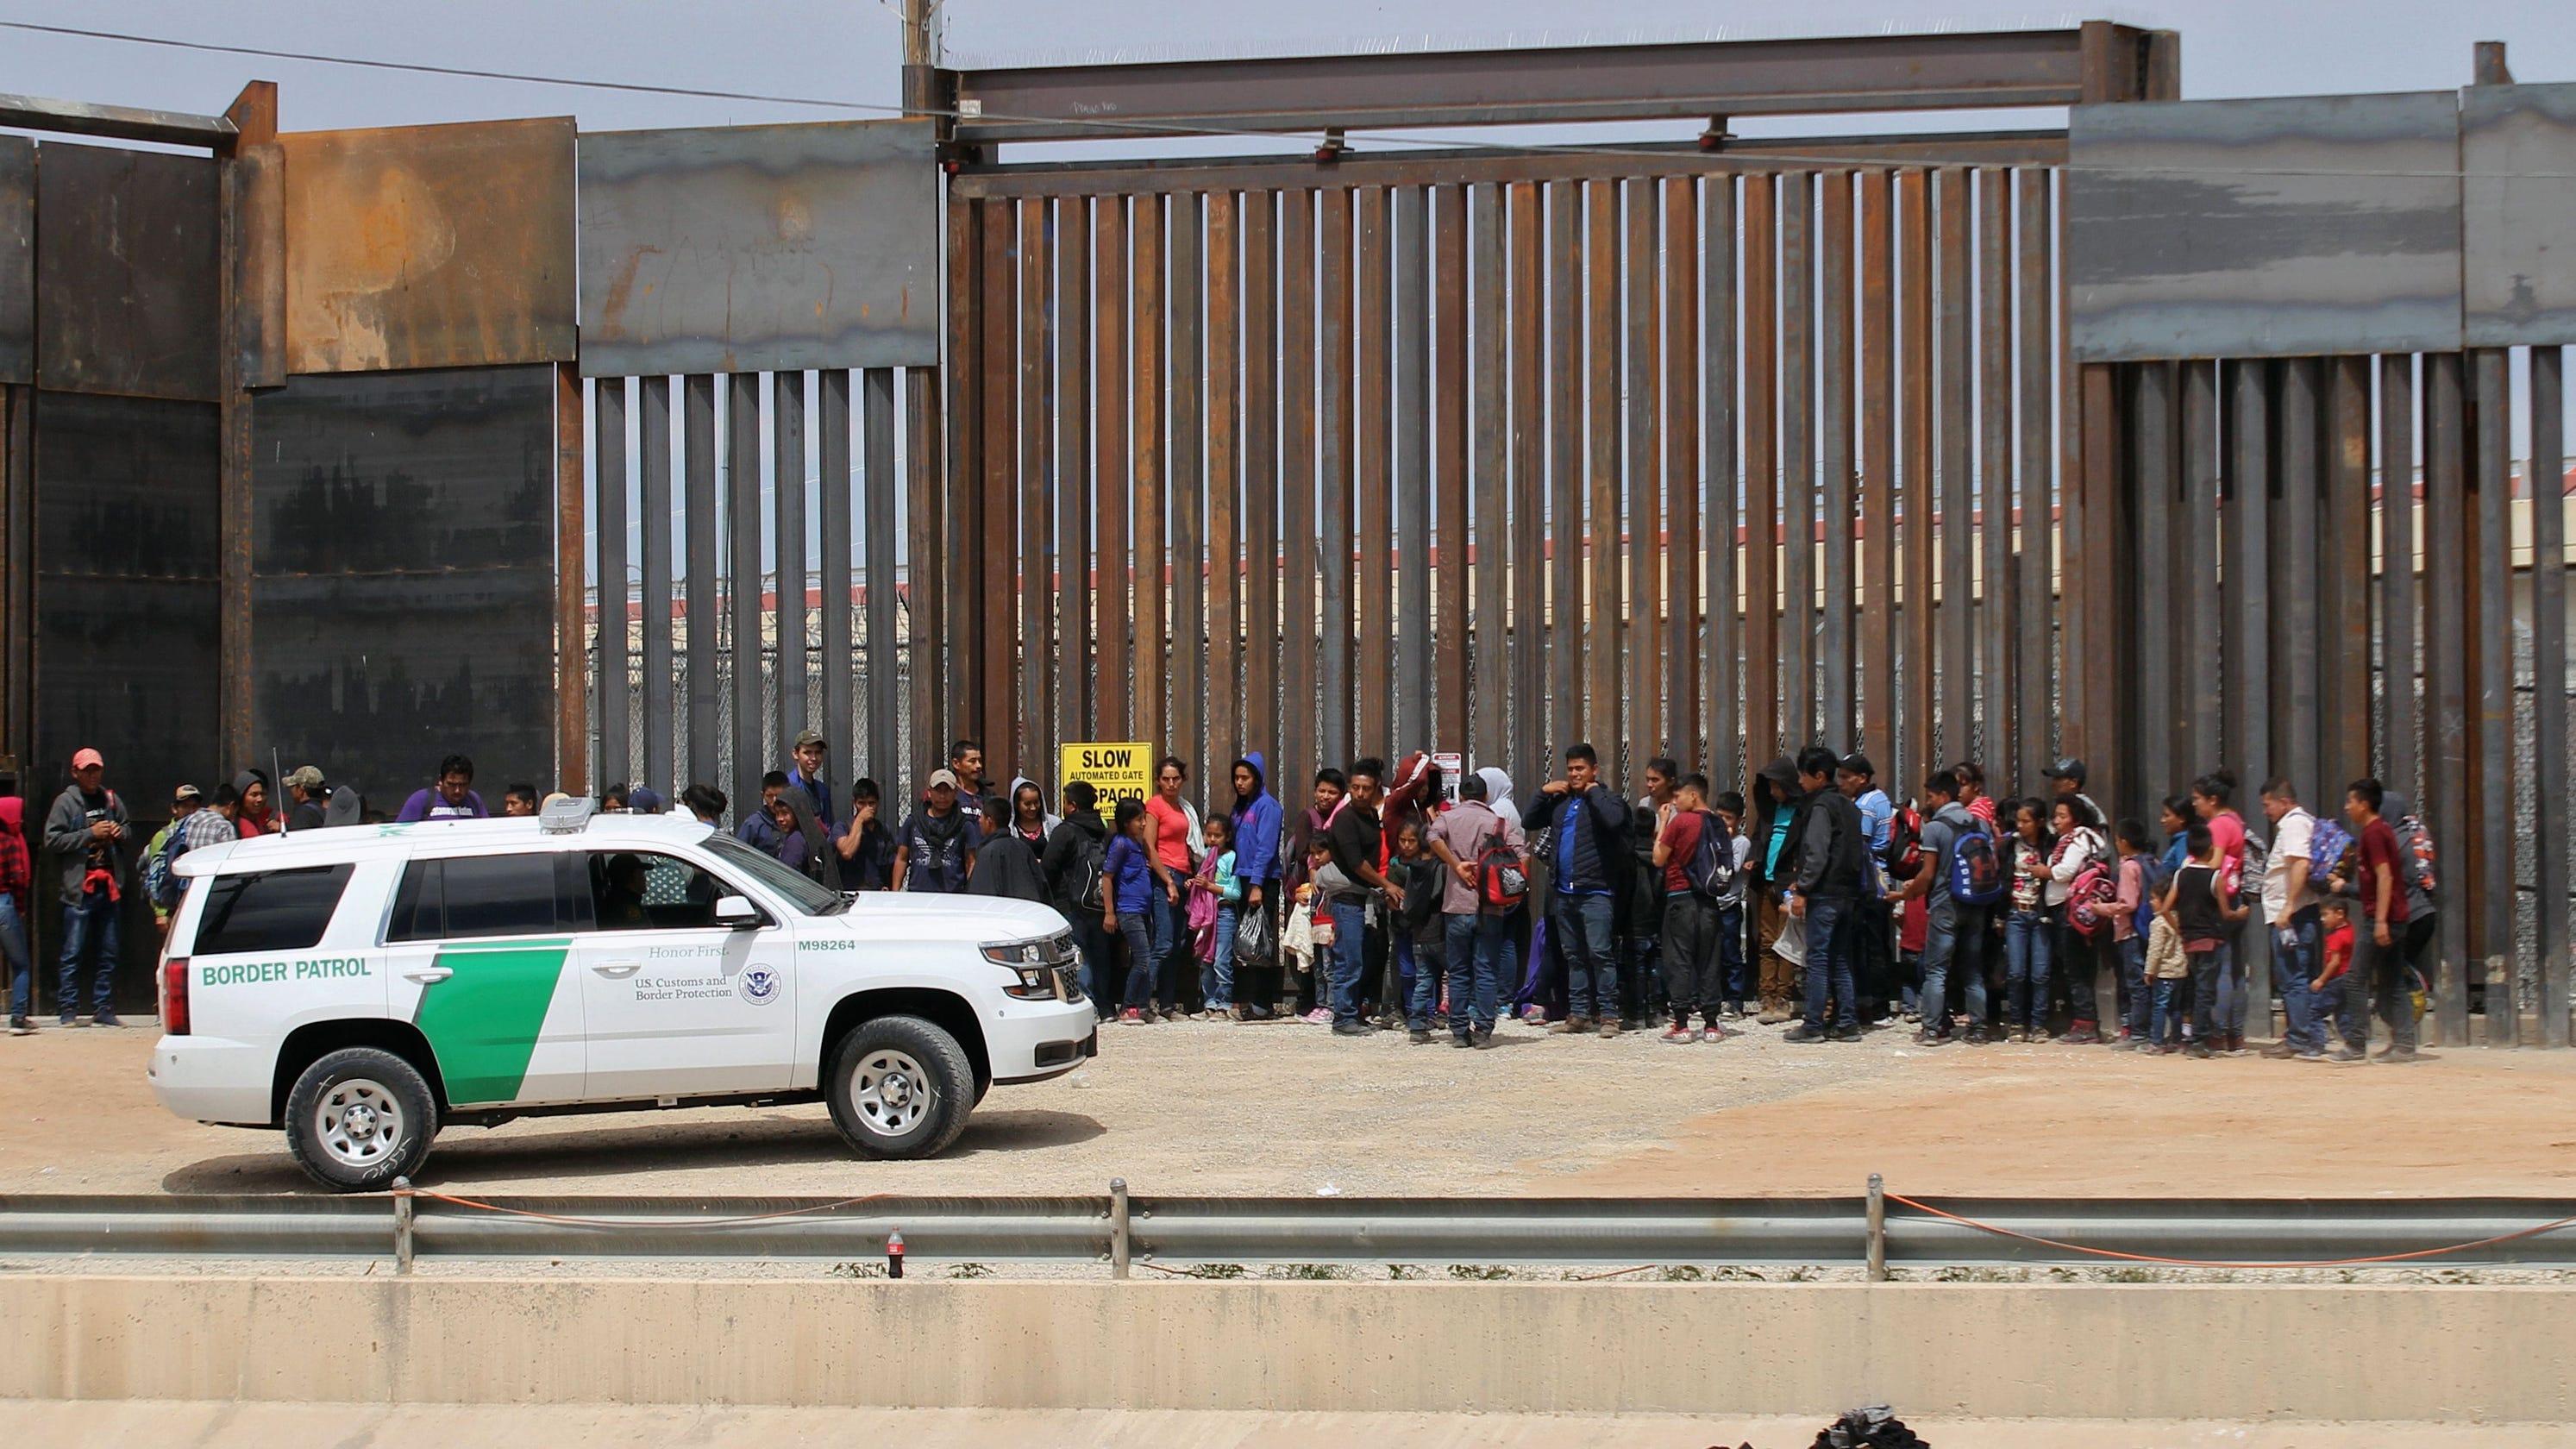 trumps border plan - HD2987×1680